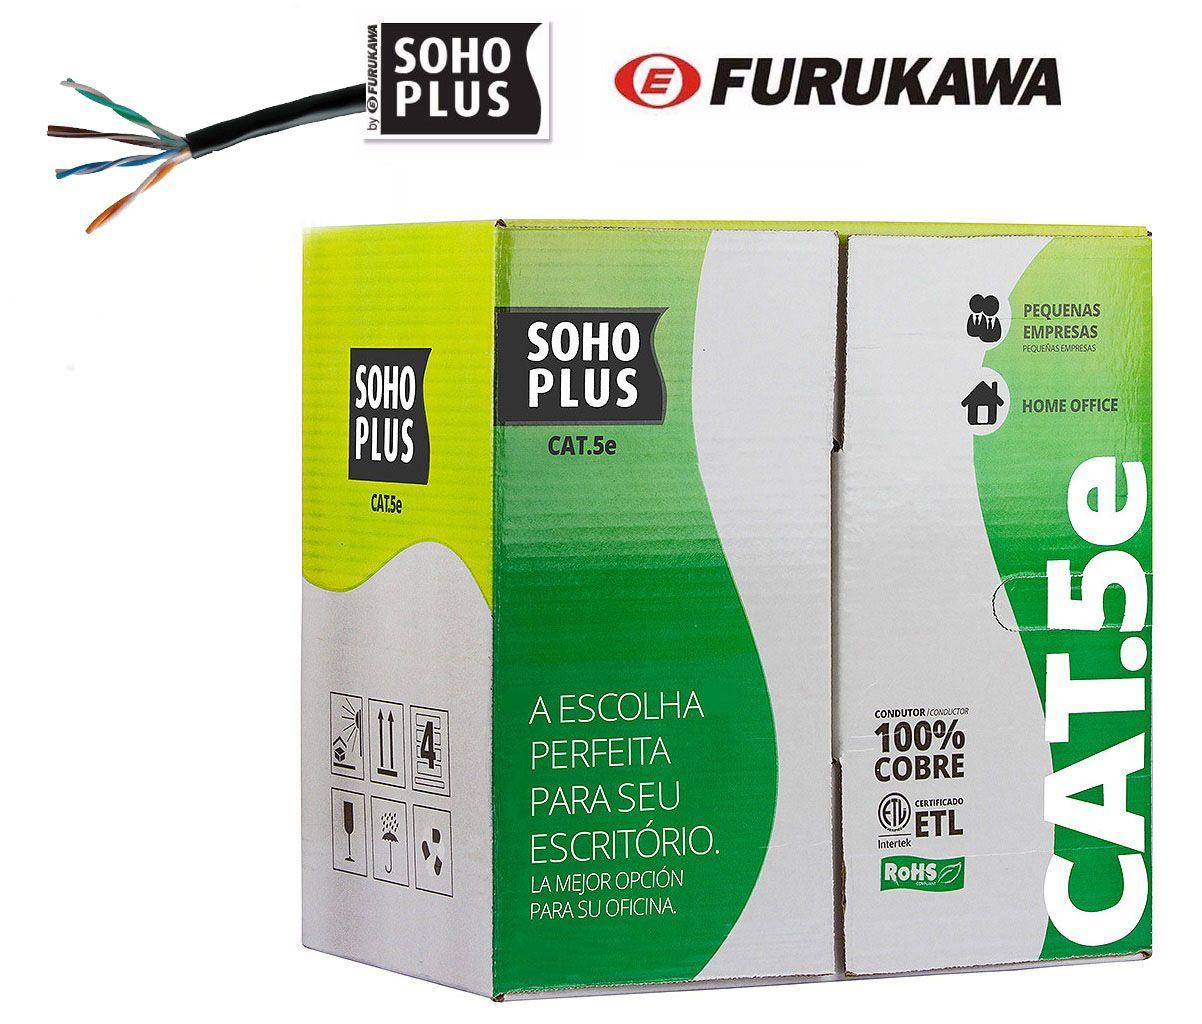 Cabo de Rede Furukawa Cat5e Soho Plus Preto 100 metros